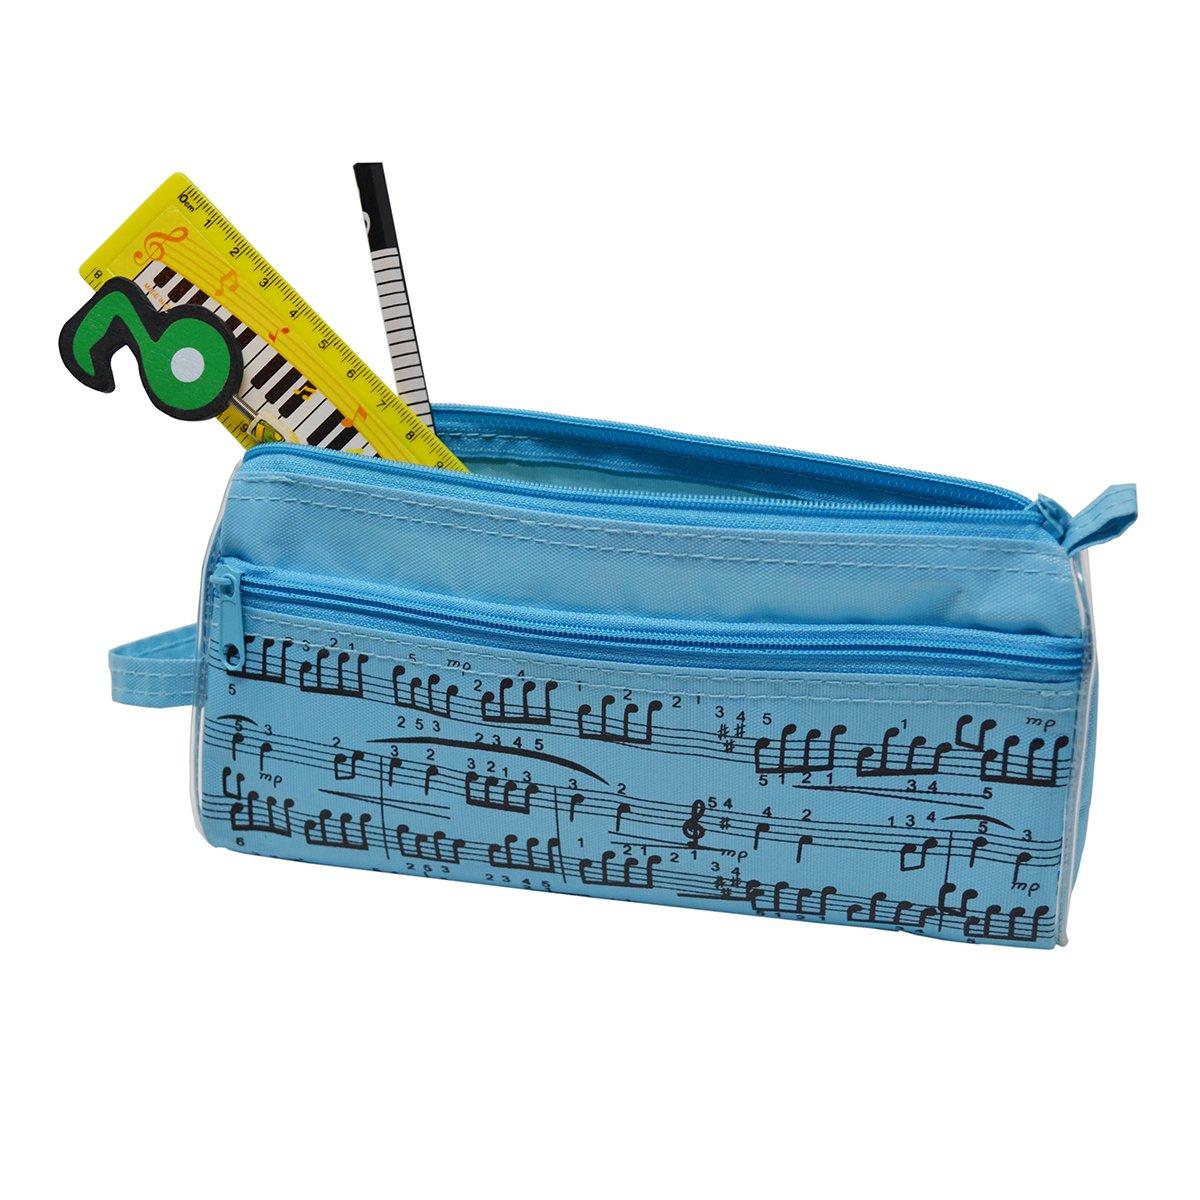 Estuche para lápices de notas musicales, impermeable, tela Oxford, portátil, bolsa de papelería con cristal capacitivo, color azul: Amazon.es: Oficina y papelería